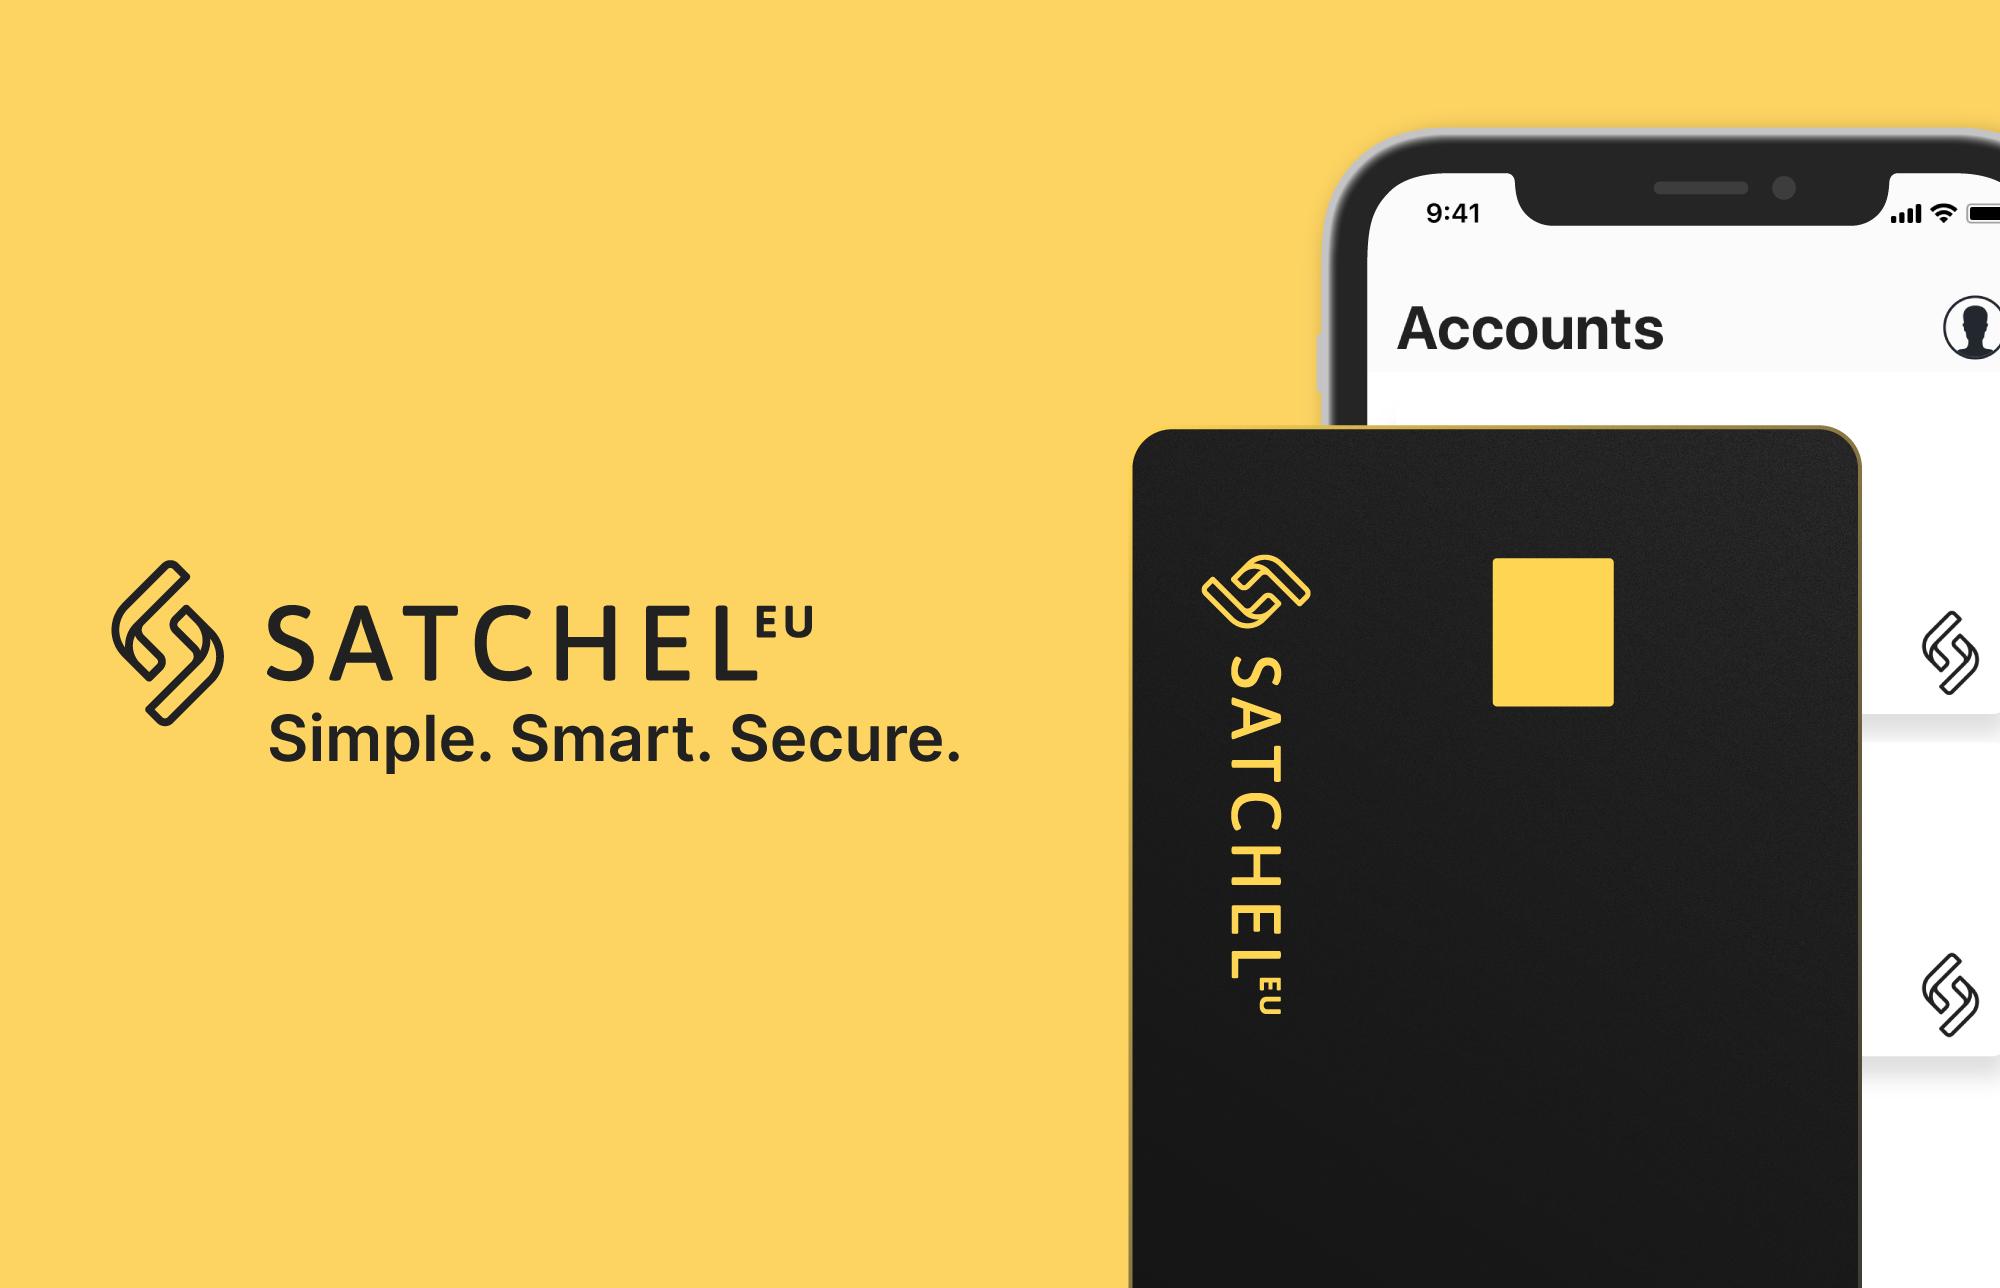 SatchelPay to Introduce the Next-Gen Satchel Fintech Ecosystem